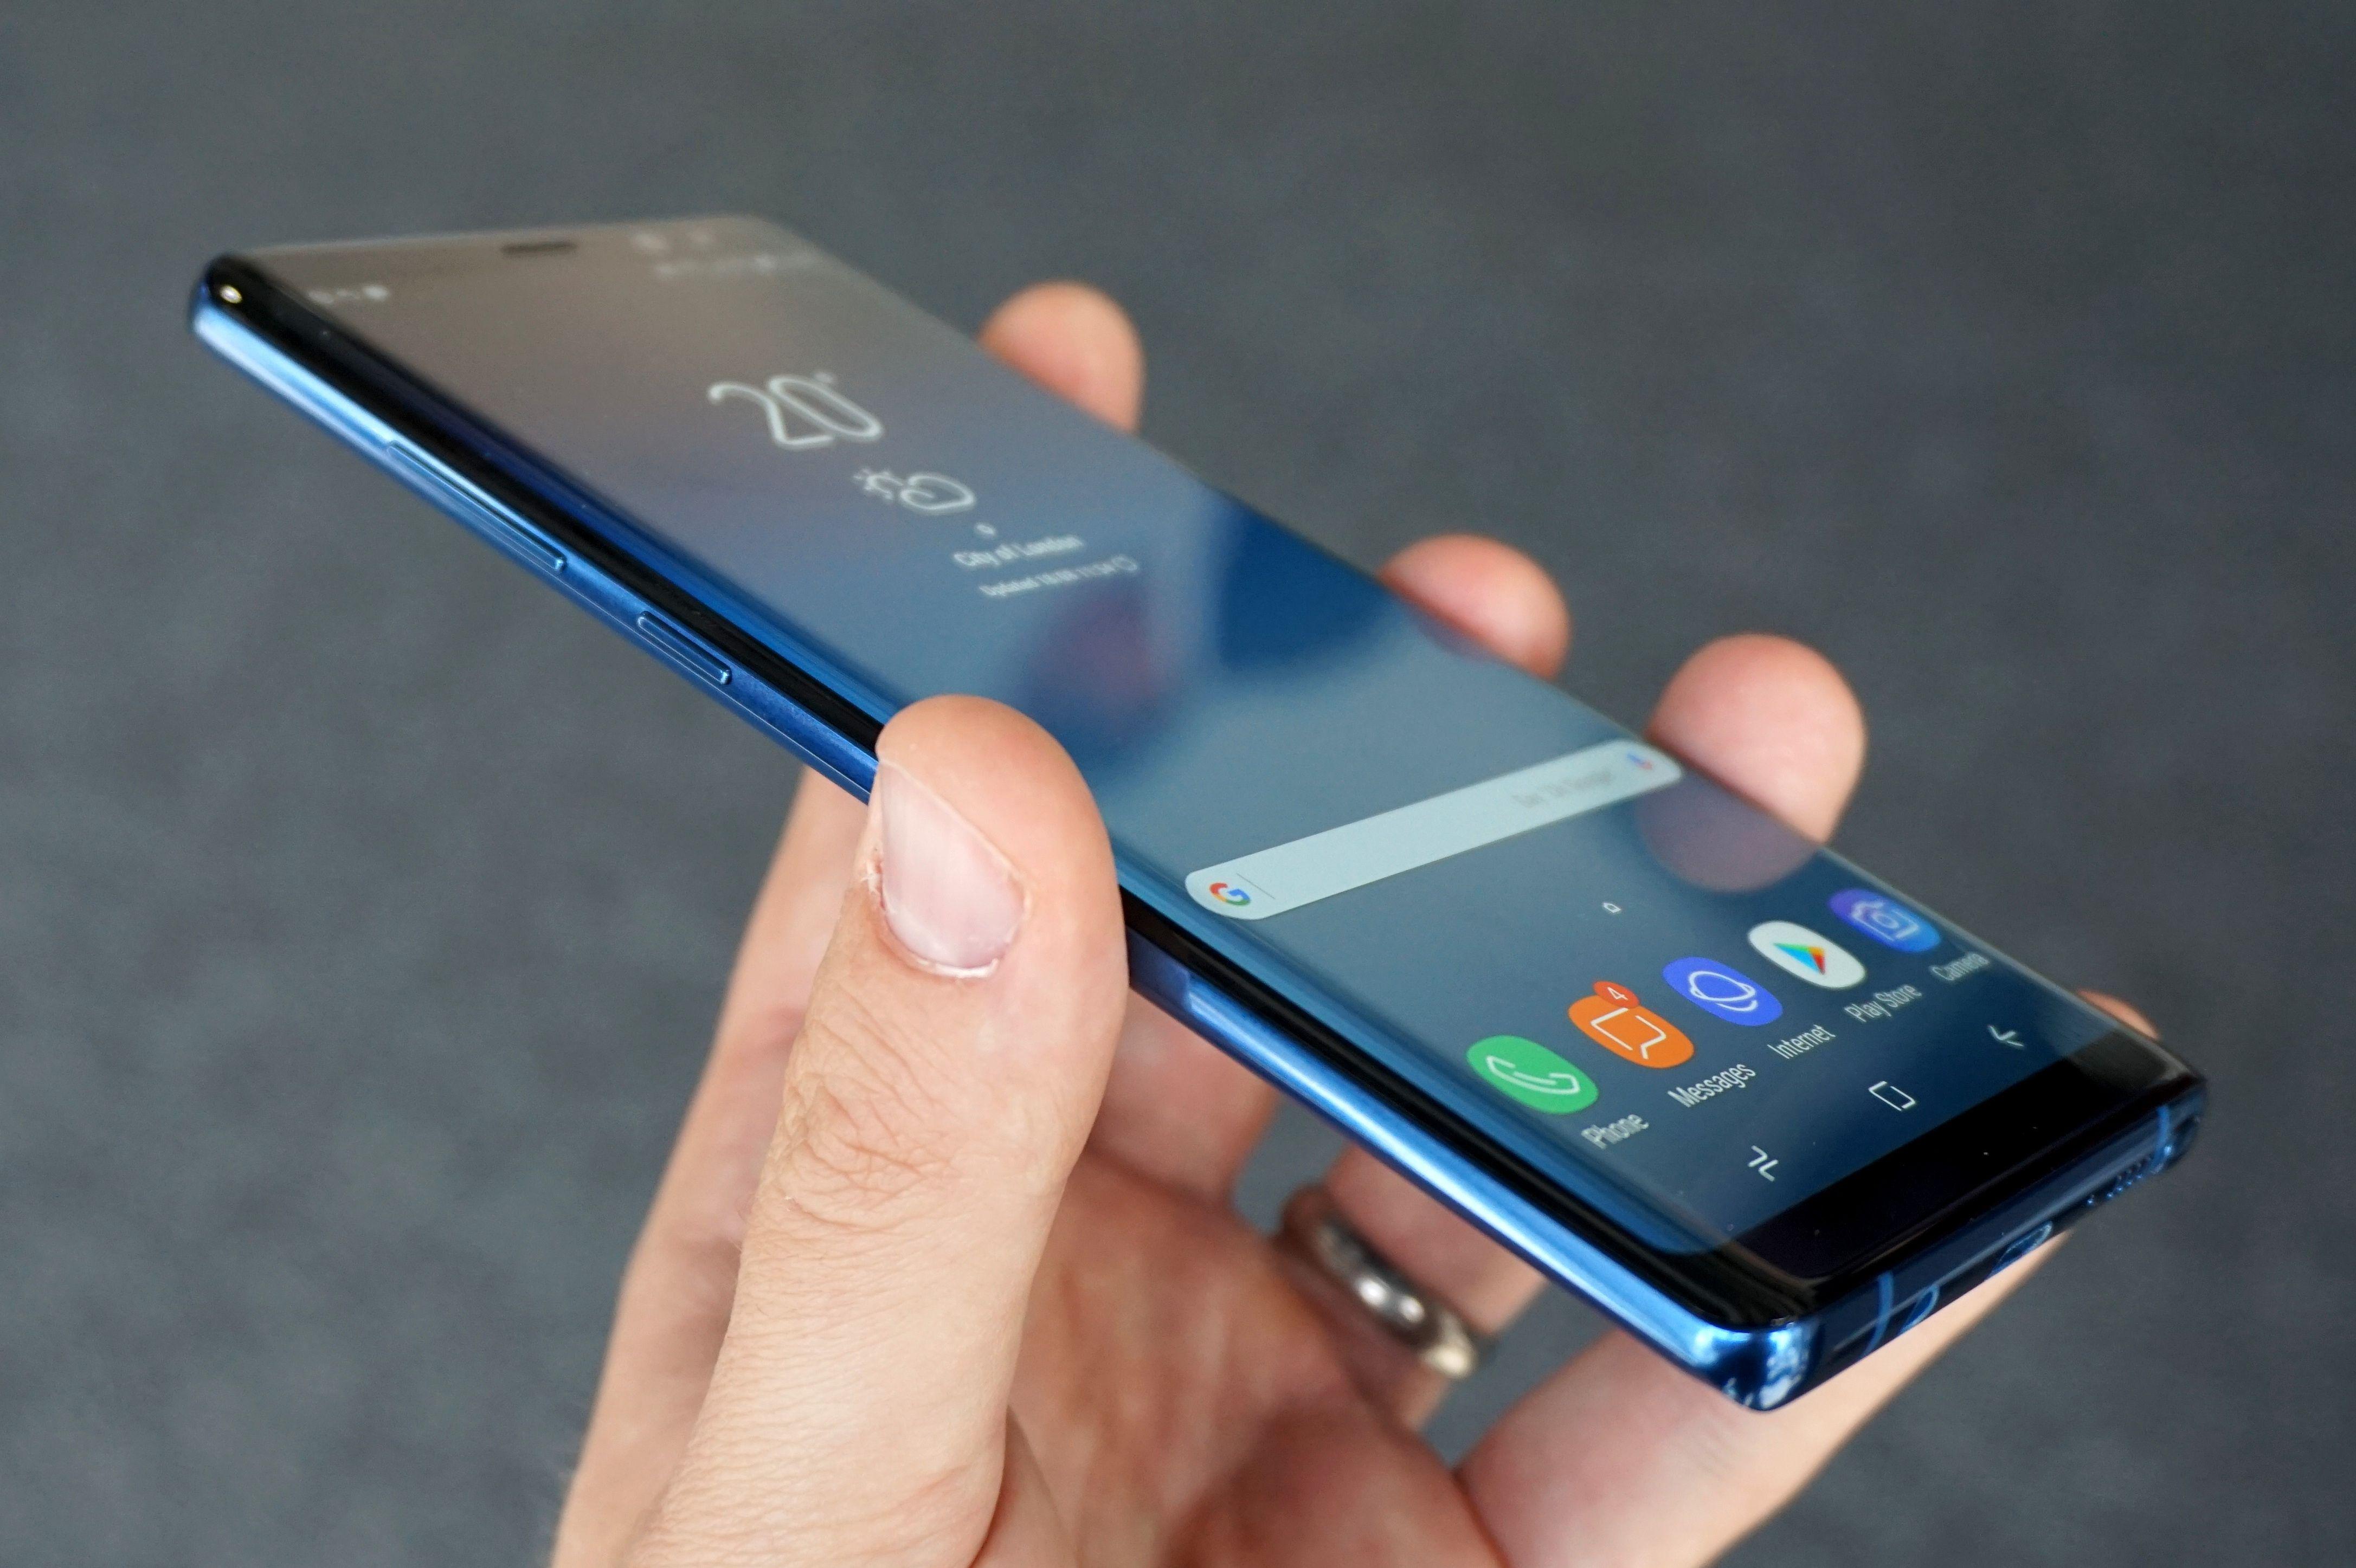 Handy Mit Vertrag Iphone S Plus